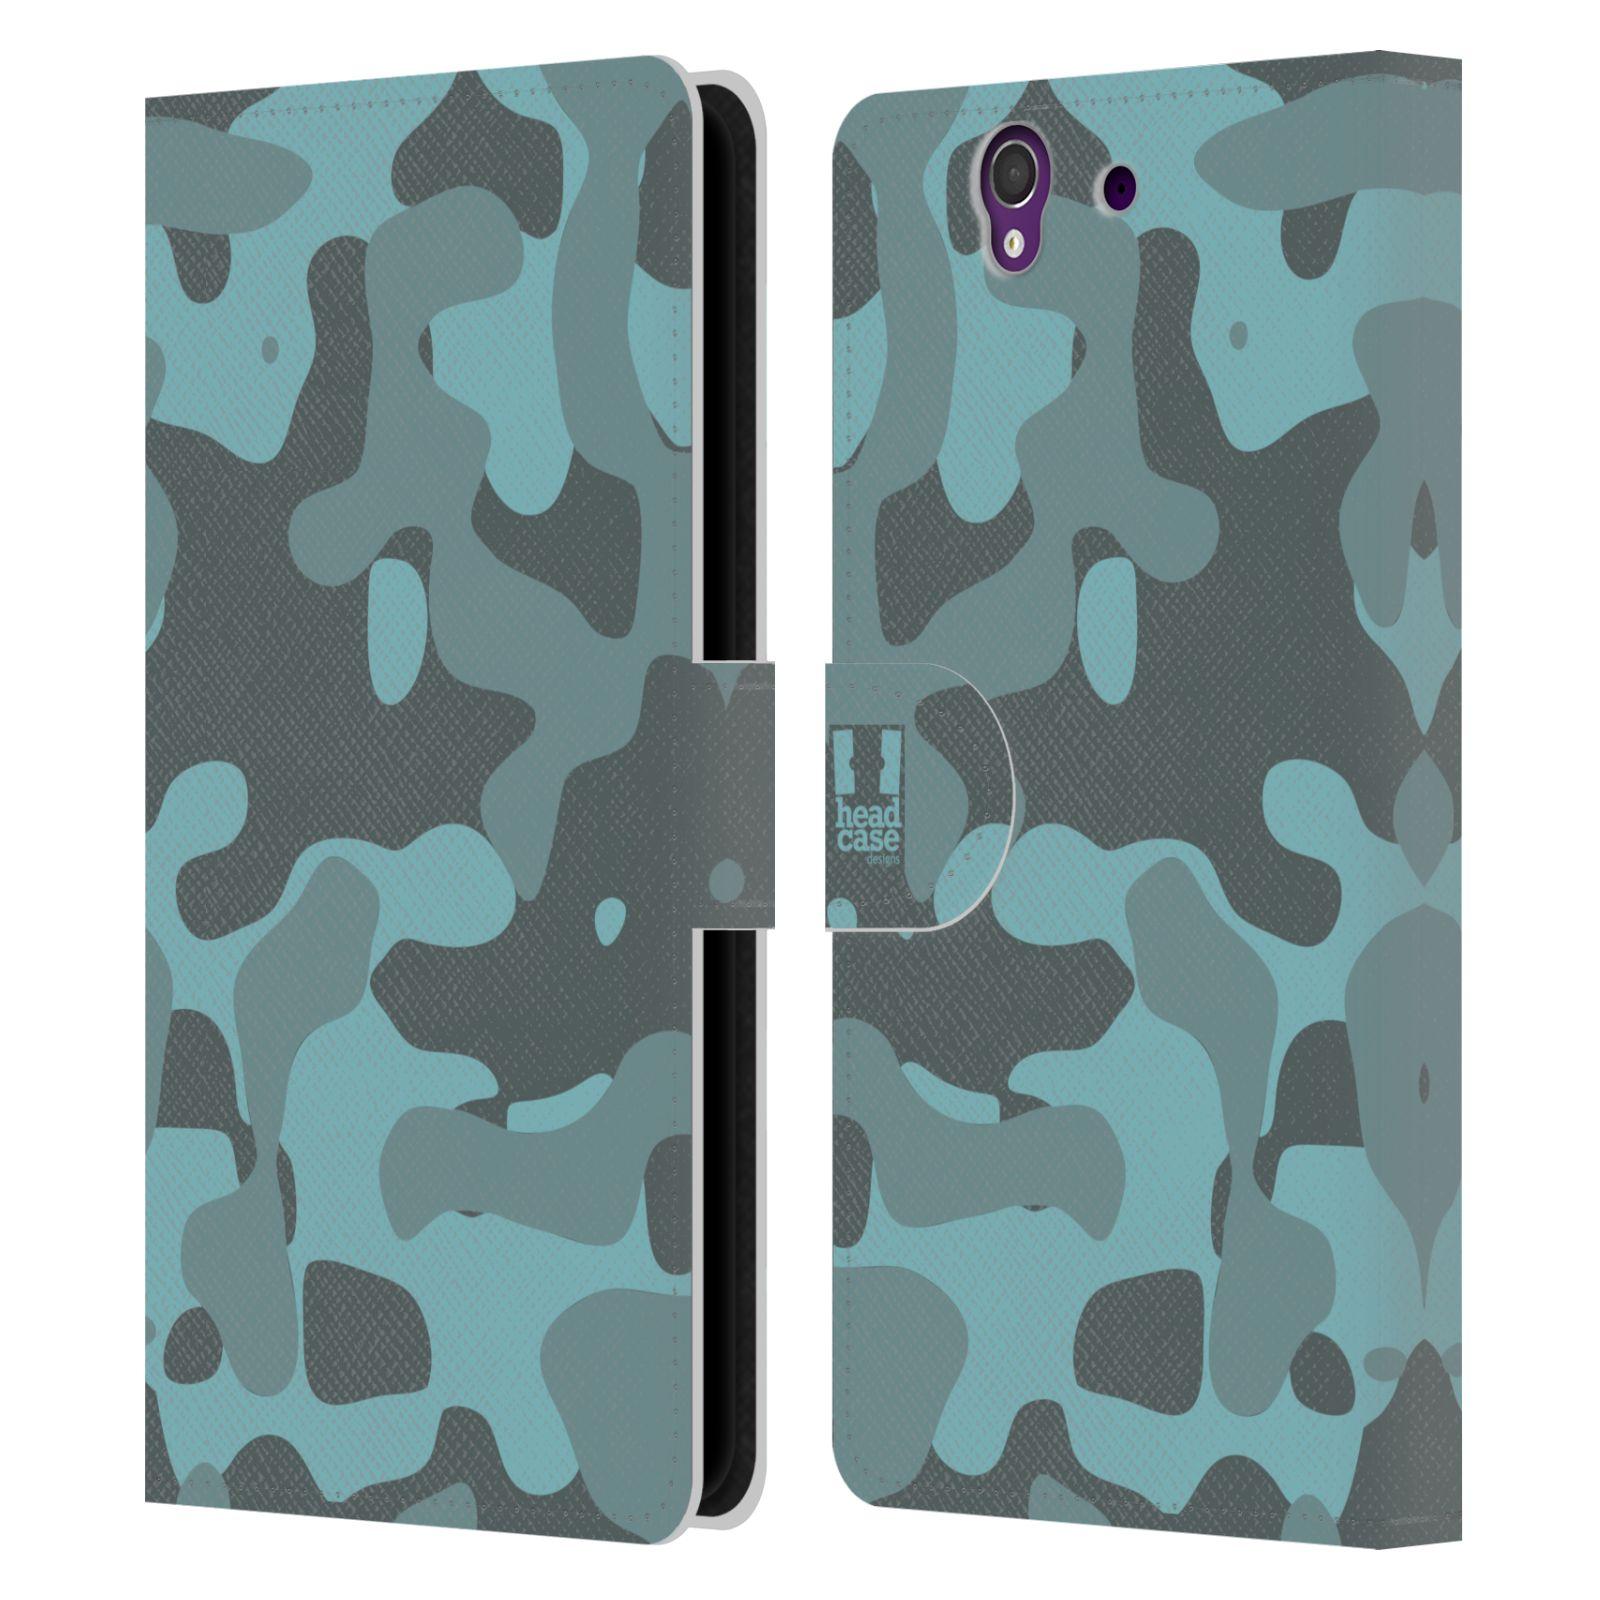 HEAD CASE Flipové pouzdro pro mobil SONY XPERIA Z (C6603) lehká barevná kamufláž modrá